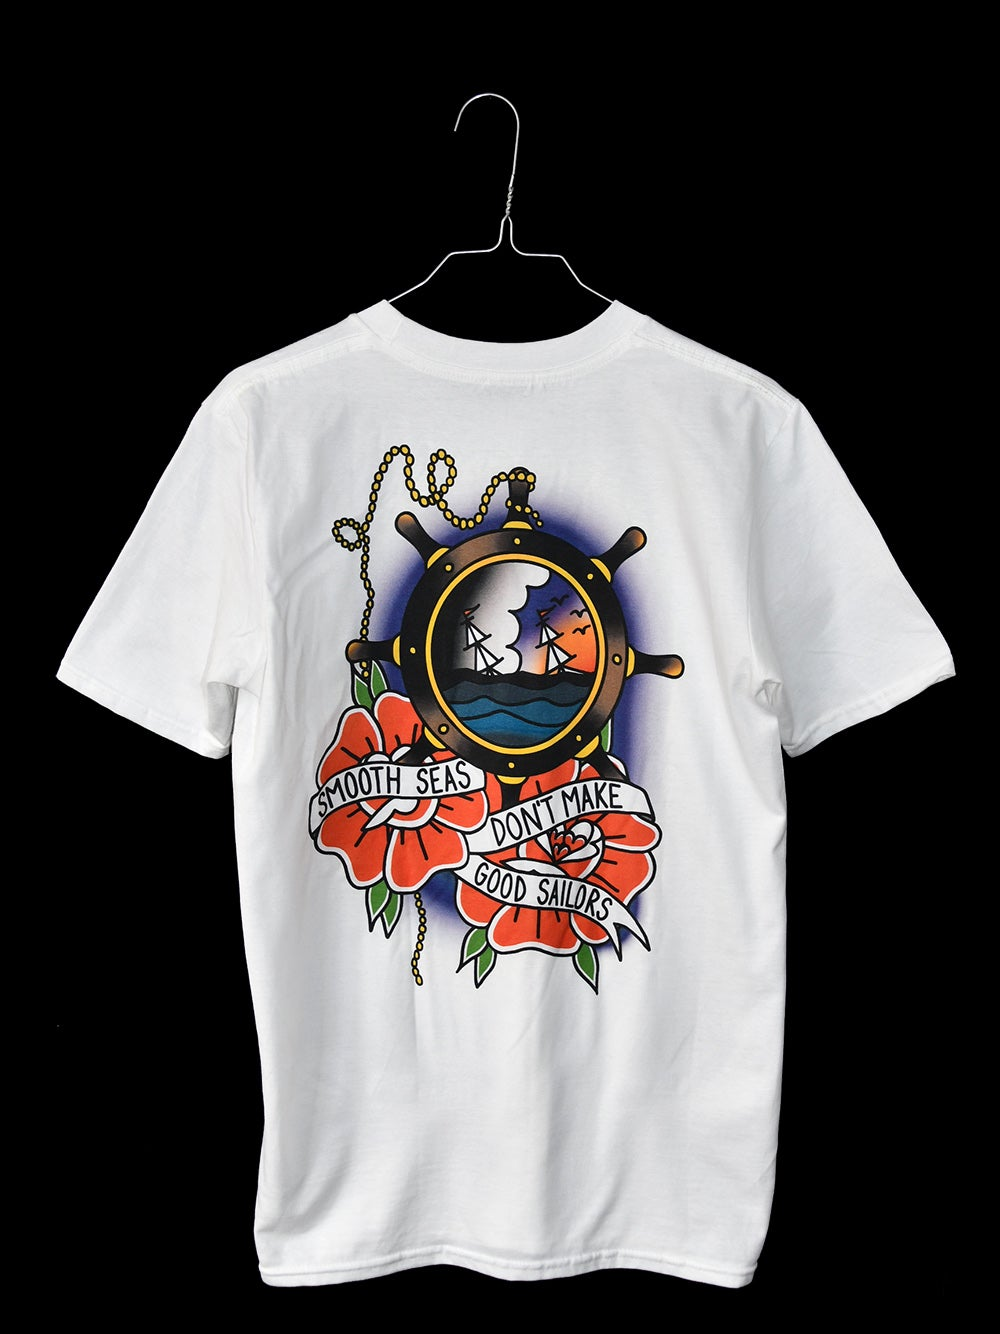 Image of T-shirt Smooth Seas